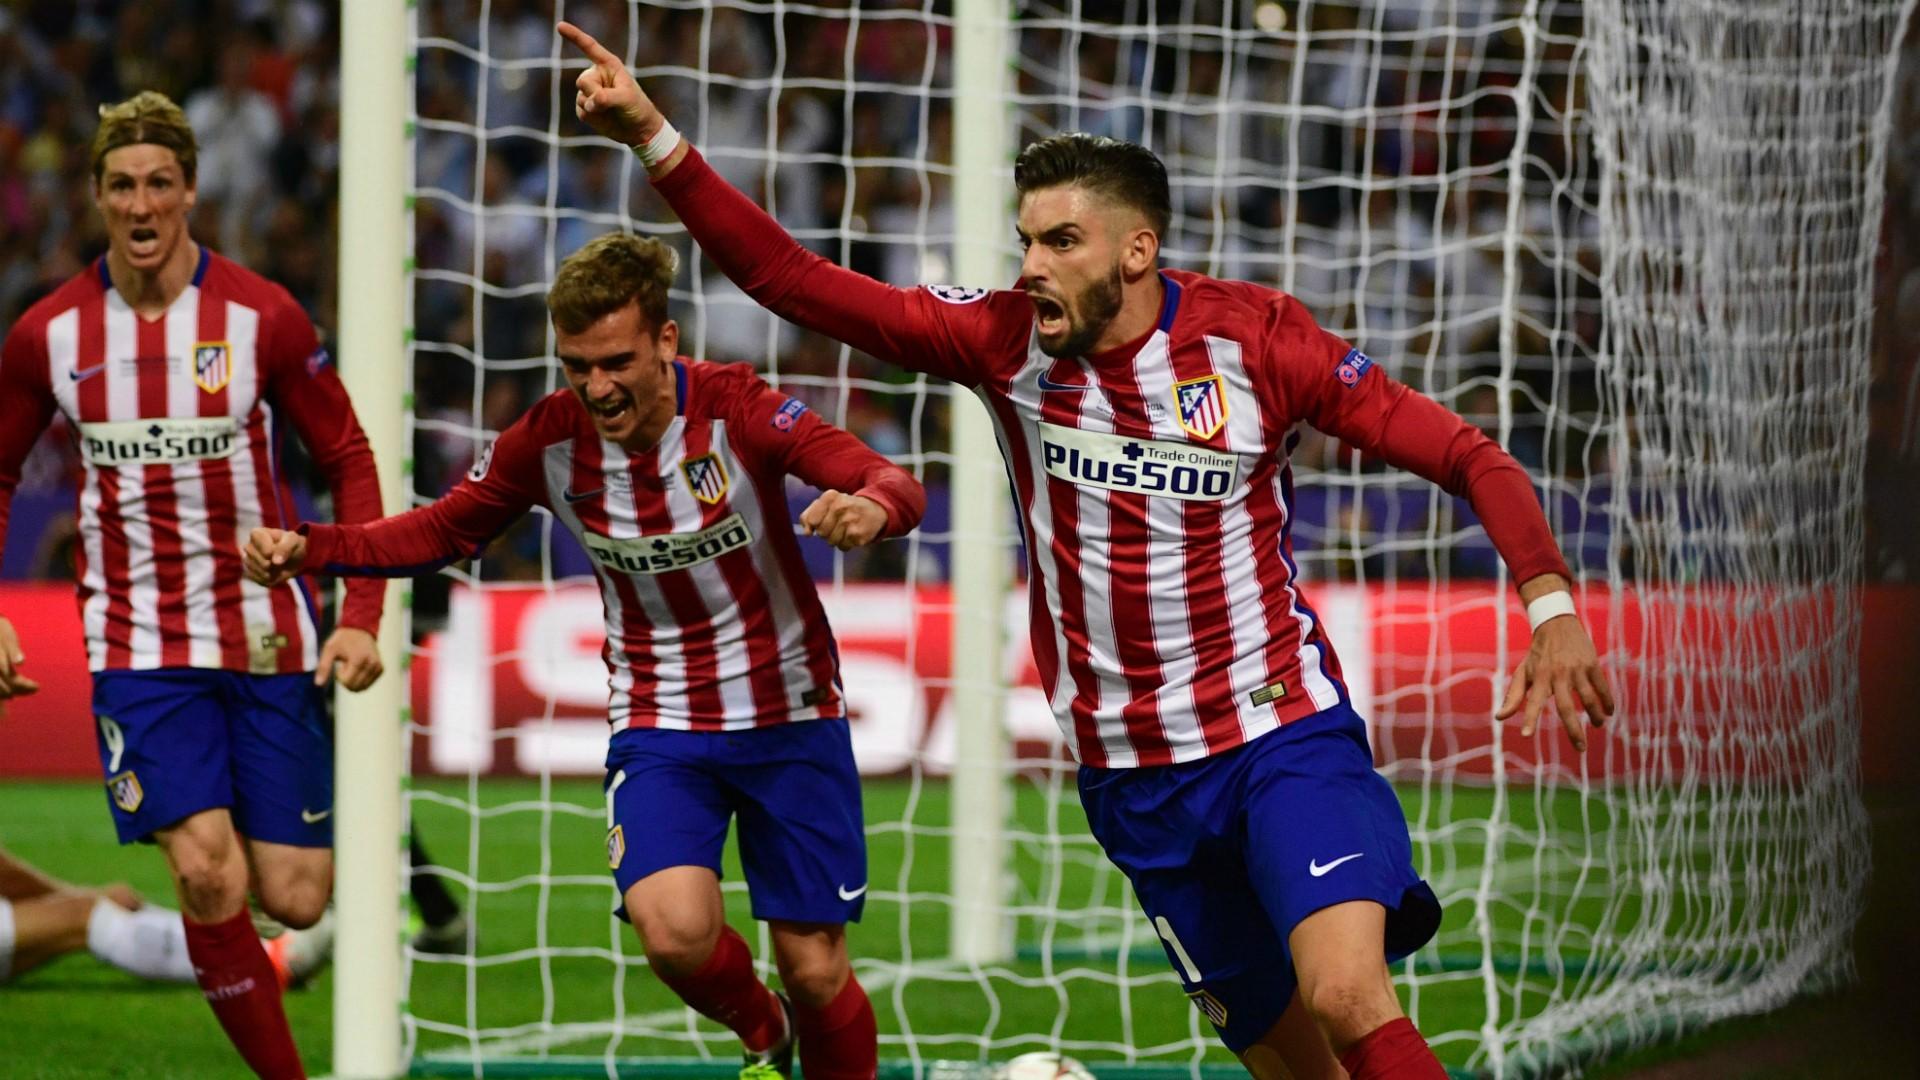 Atletico Madrid Background images